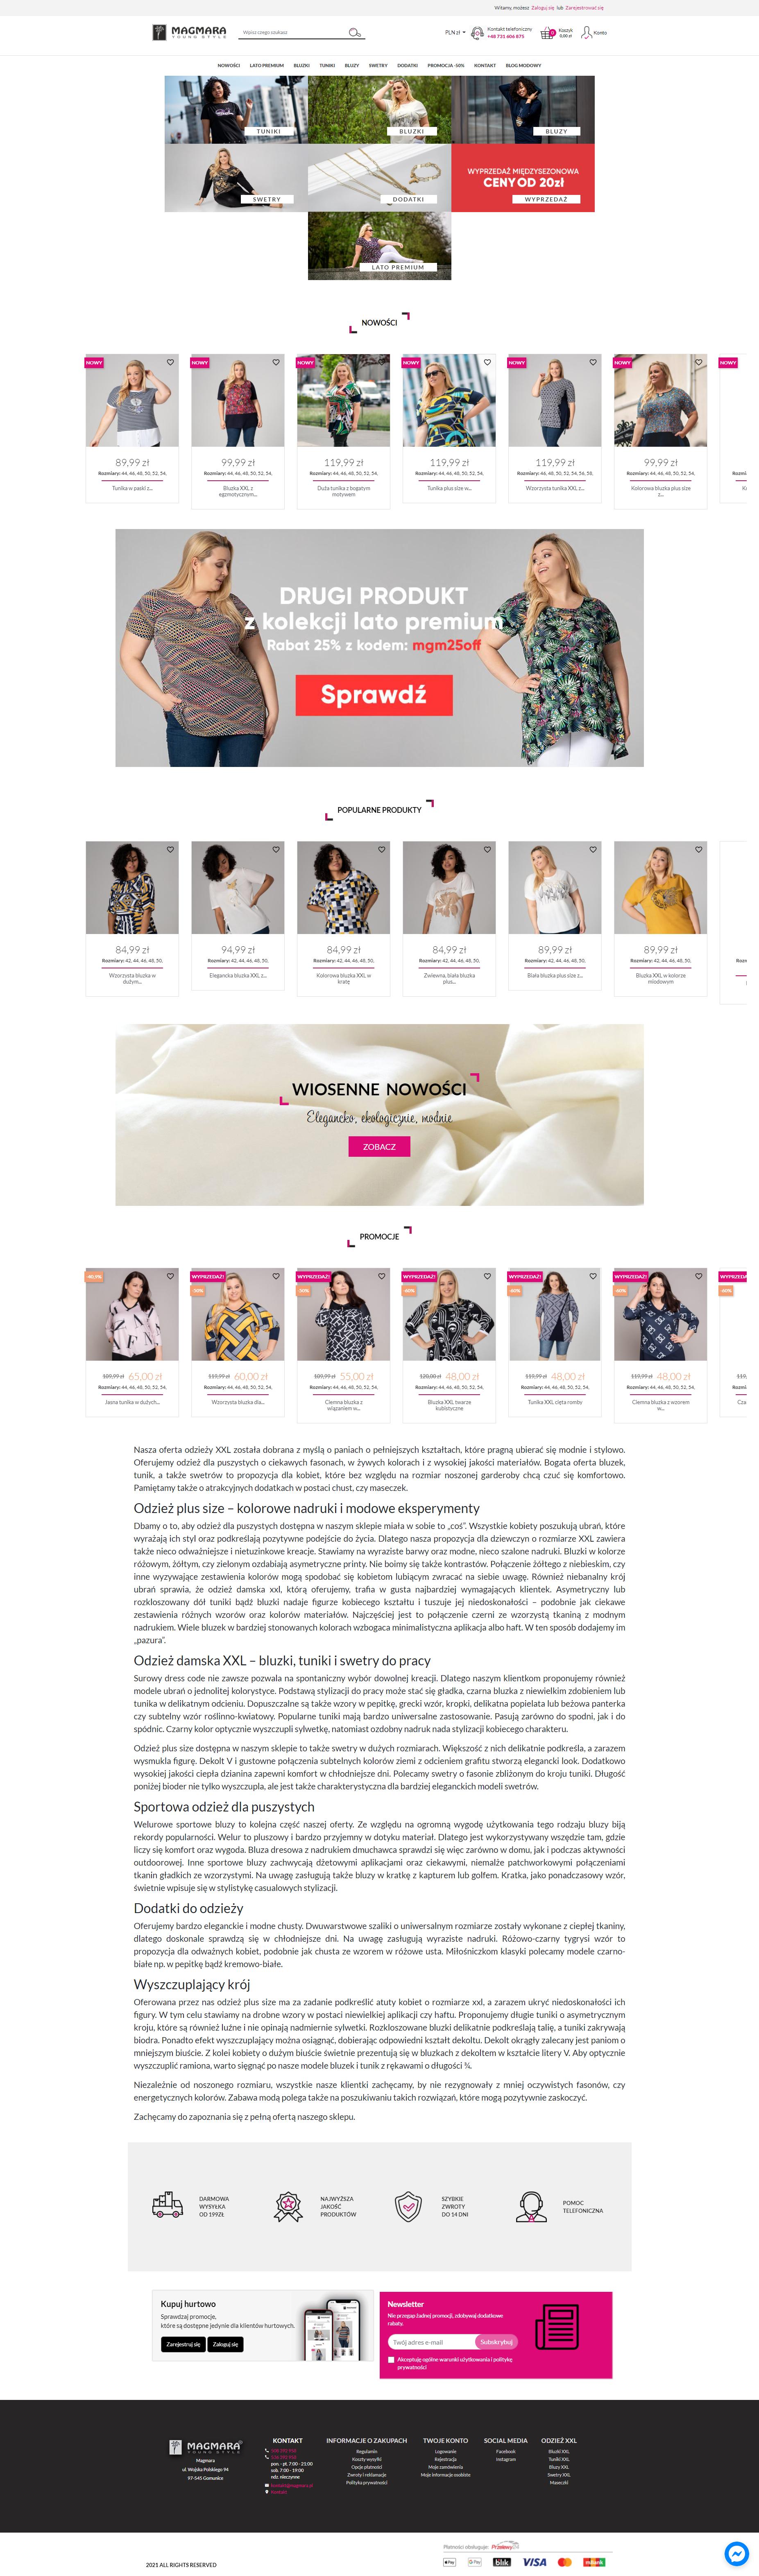 portfolio/061/164361/screencapture-magmara-pl-pl-2021-07-12-23_13_58.png